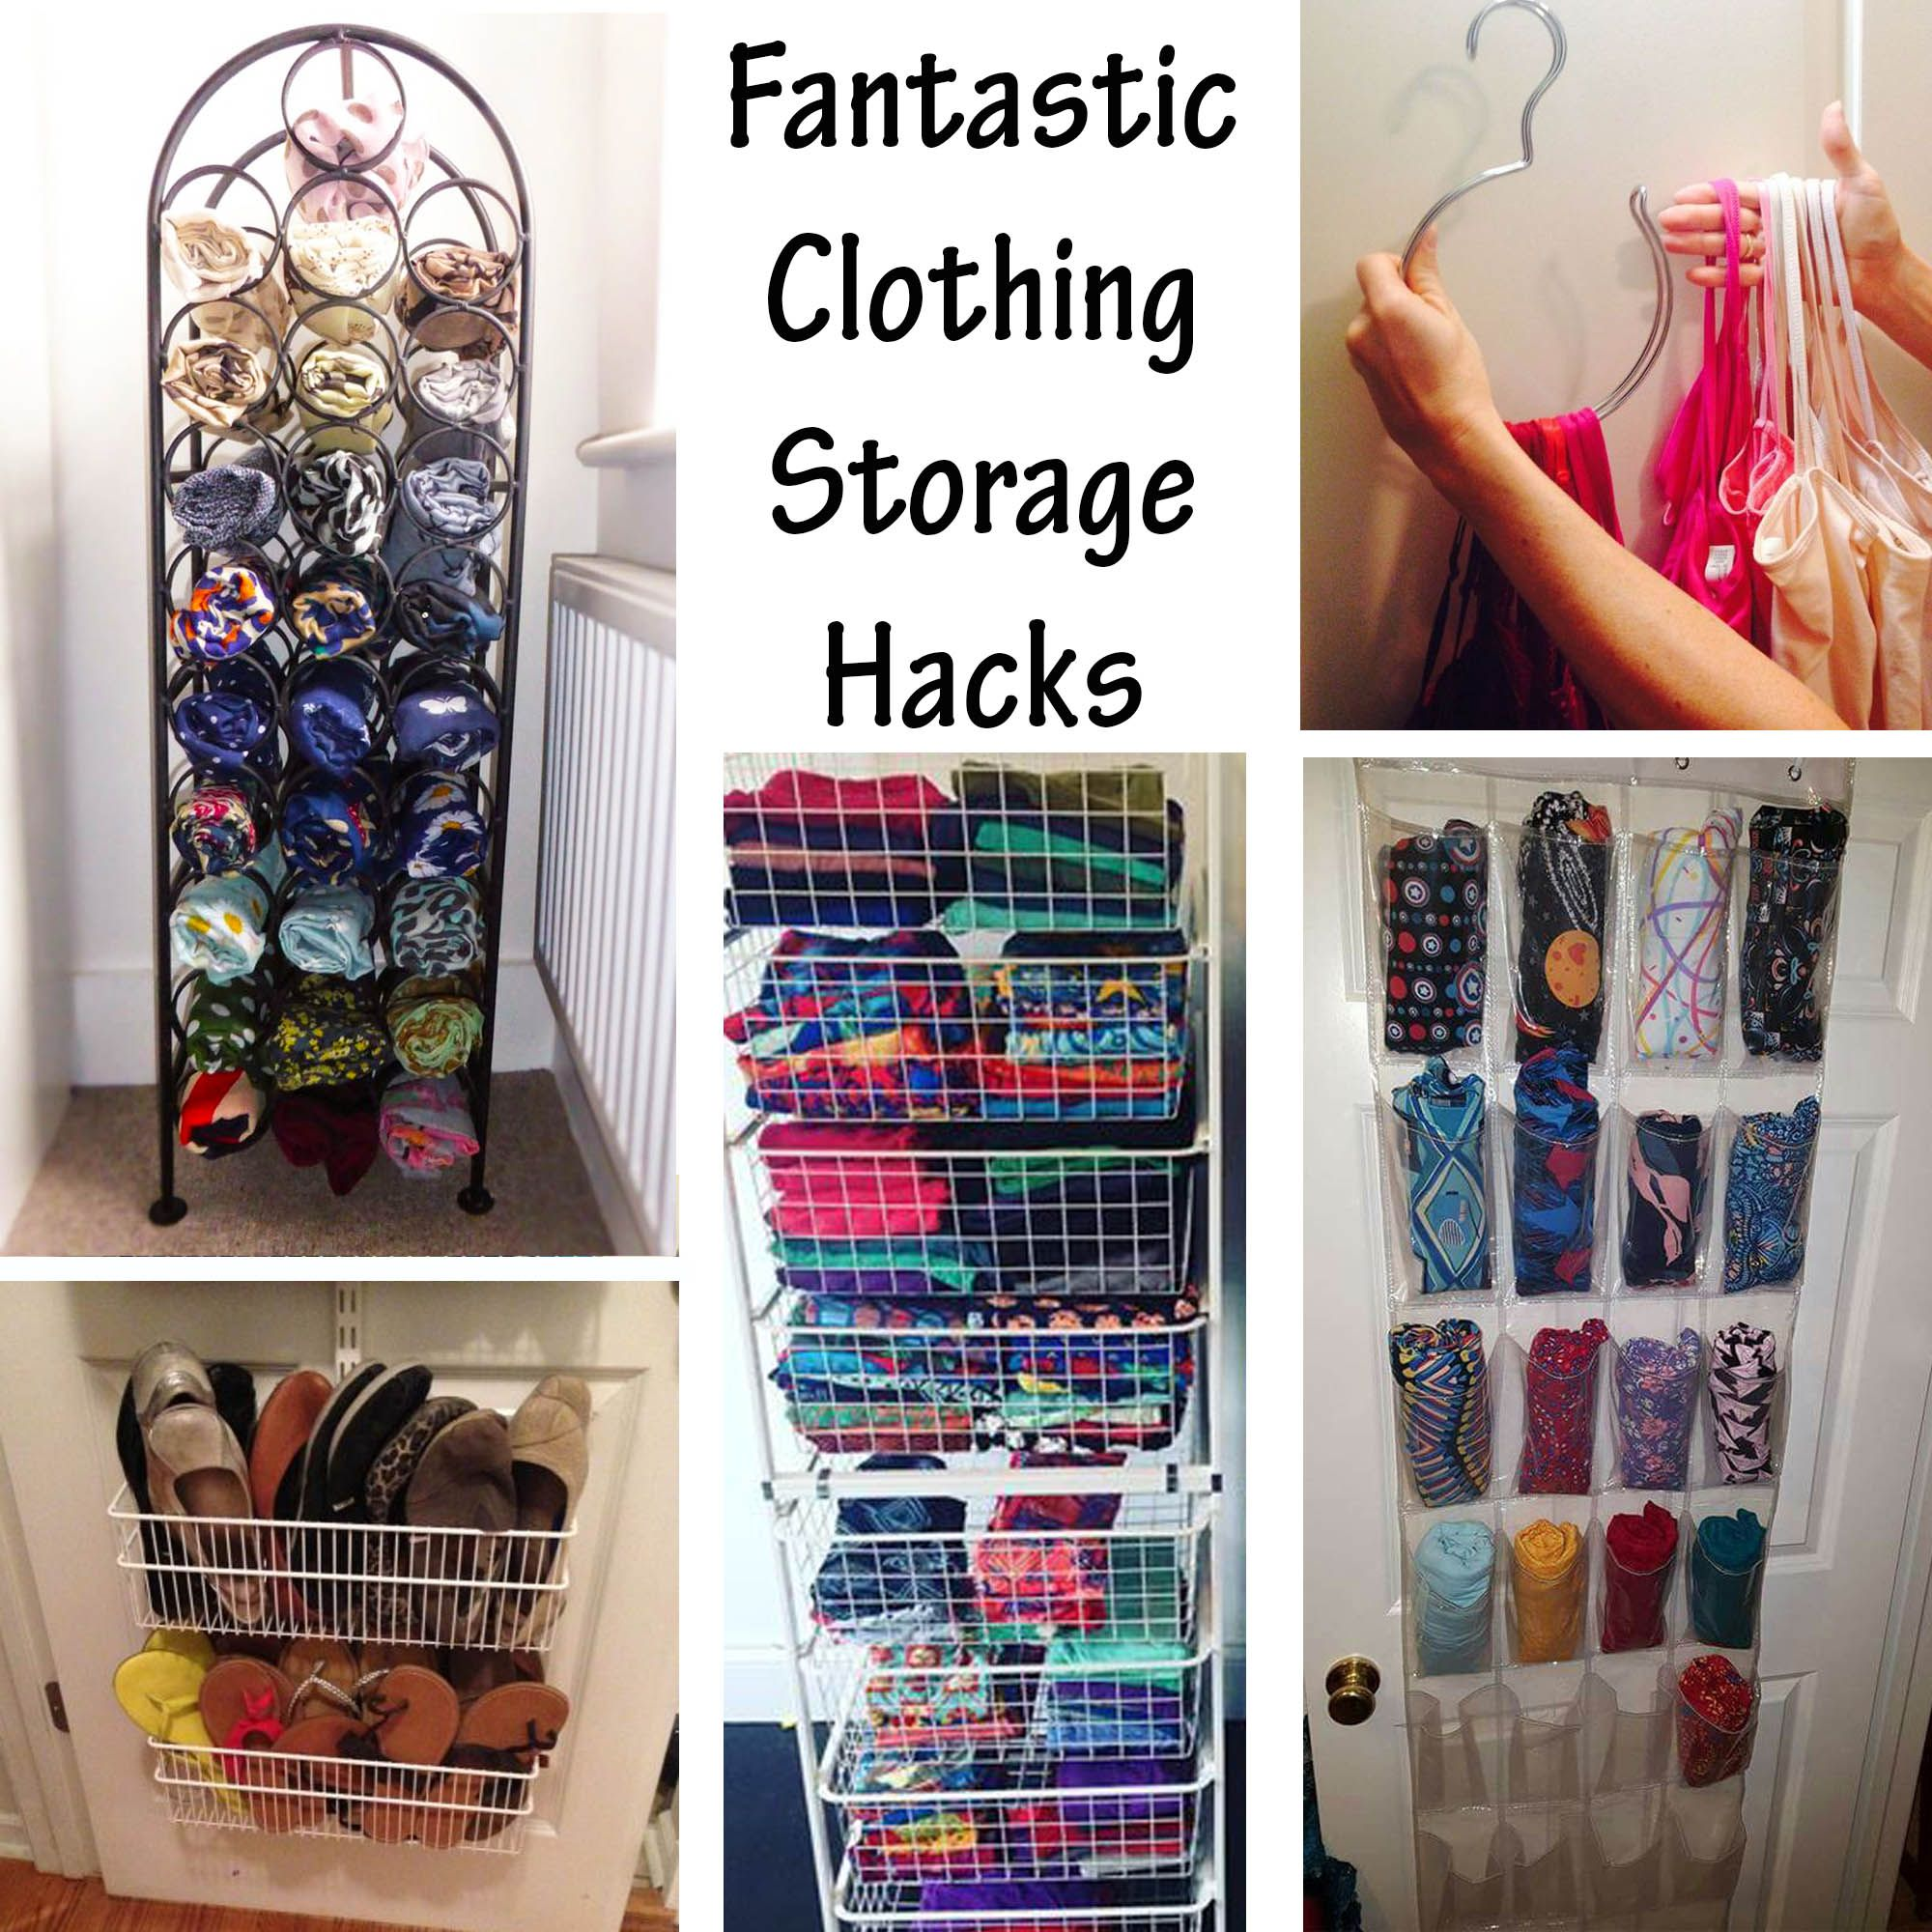 FANTASTIC CLOTHING STORAGE HACKS Bedroom storage ideas